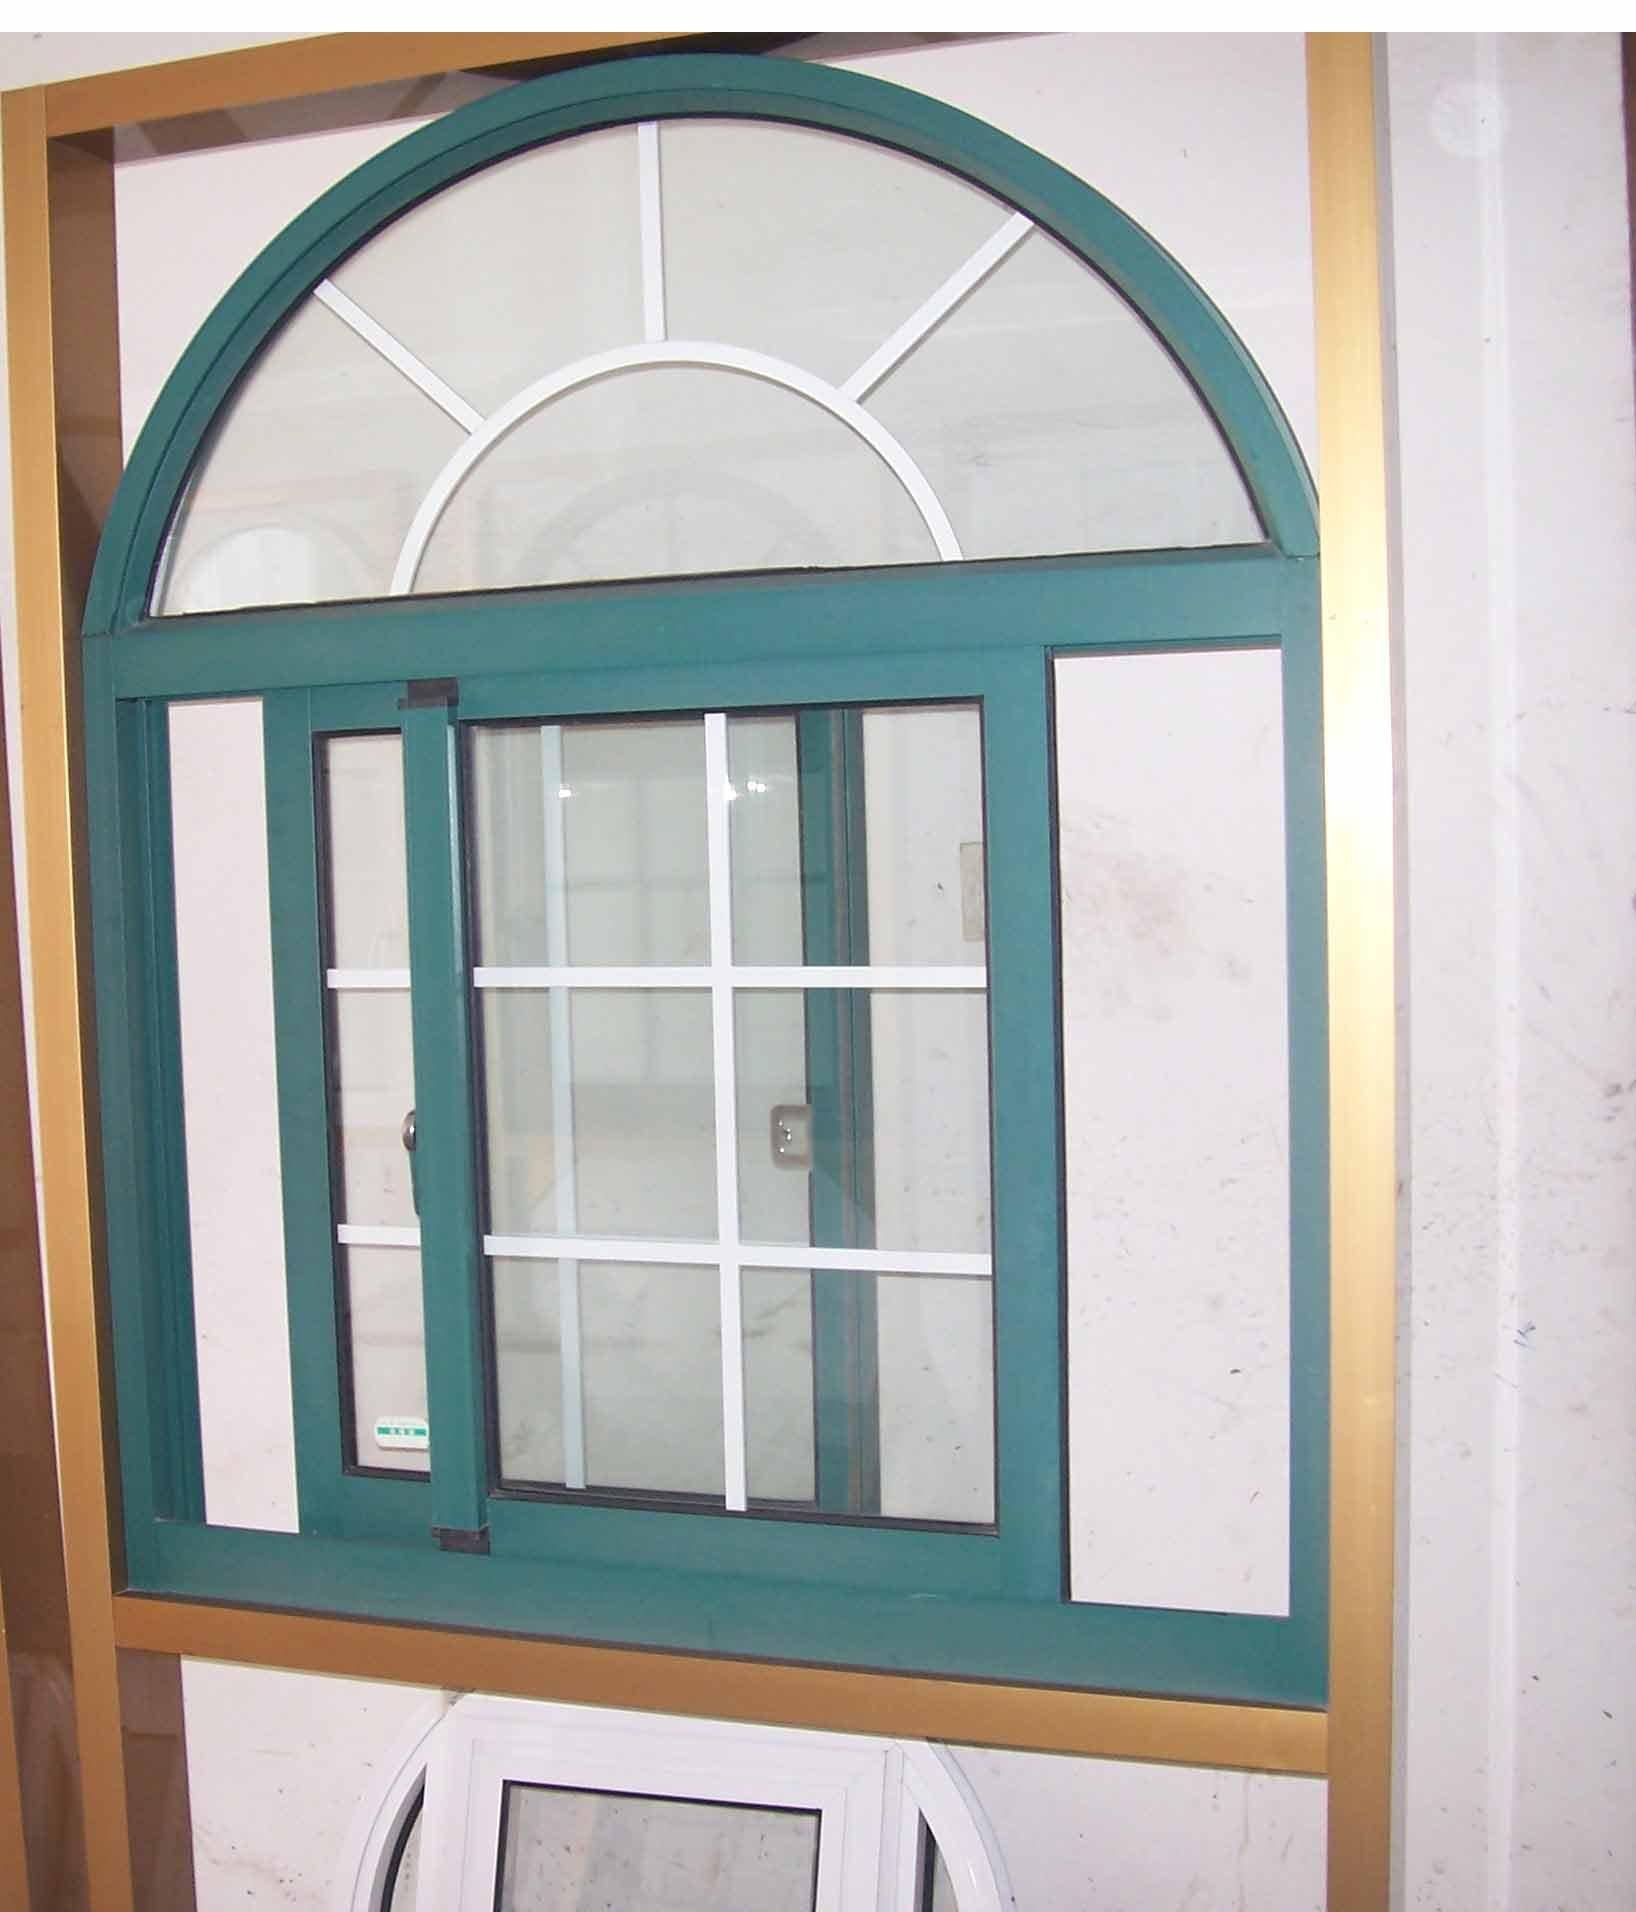 #966E35 Wanjia arco de alumínio janela WJ AS 02 Janelas ID do produto  624 Janelas Madeira Arco